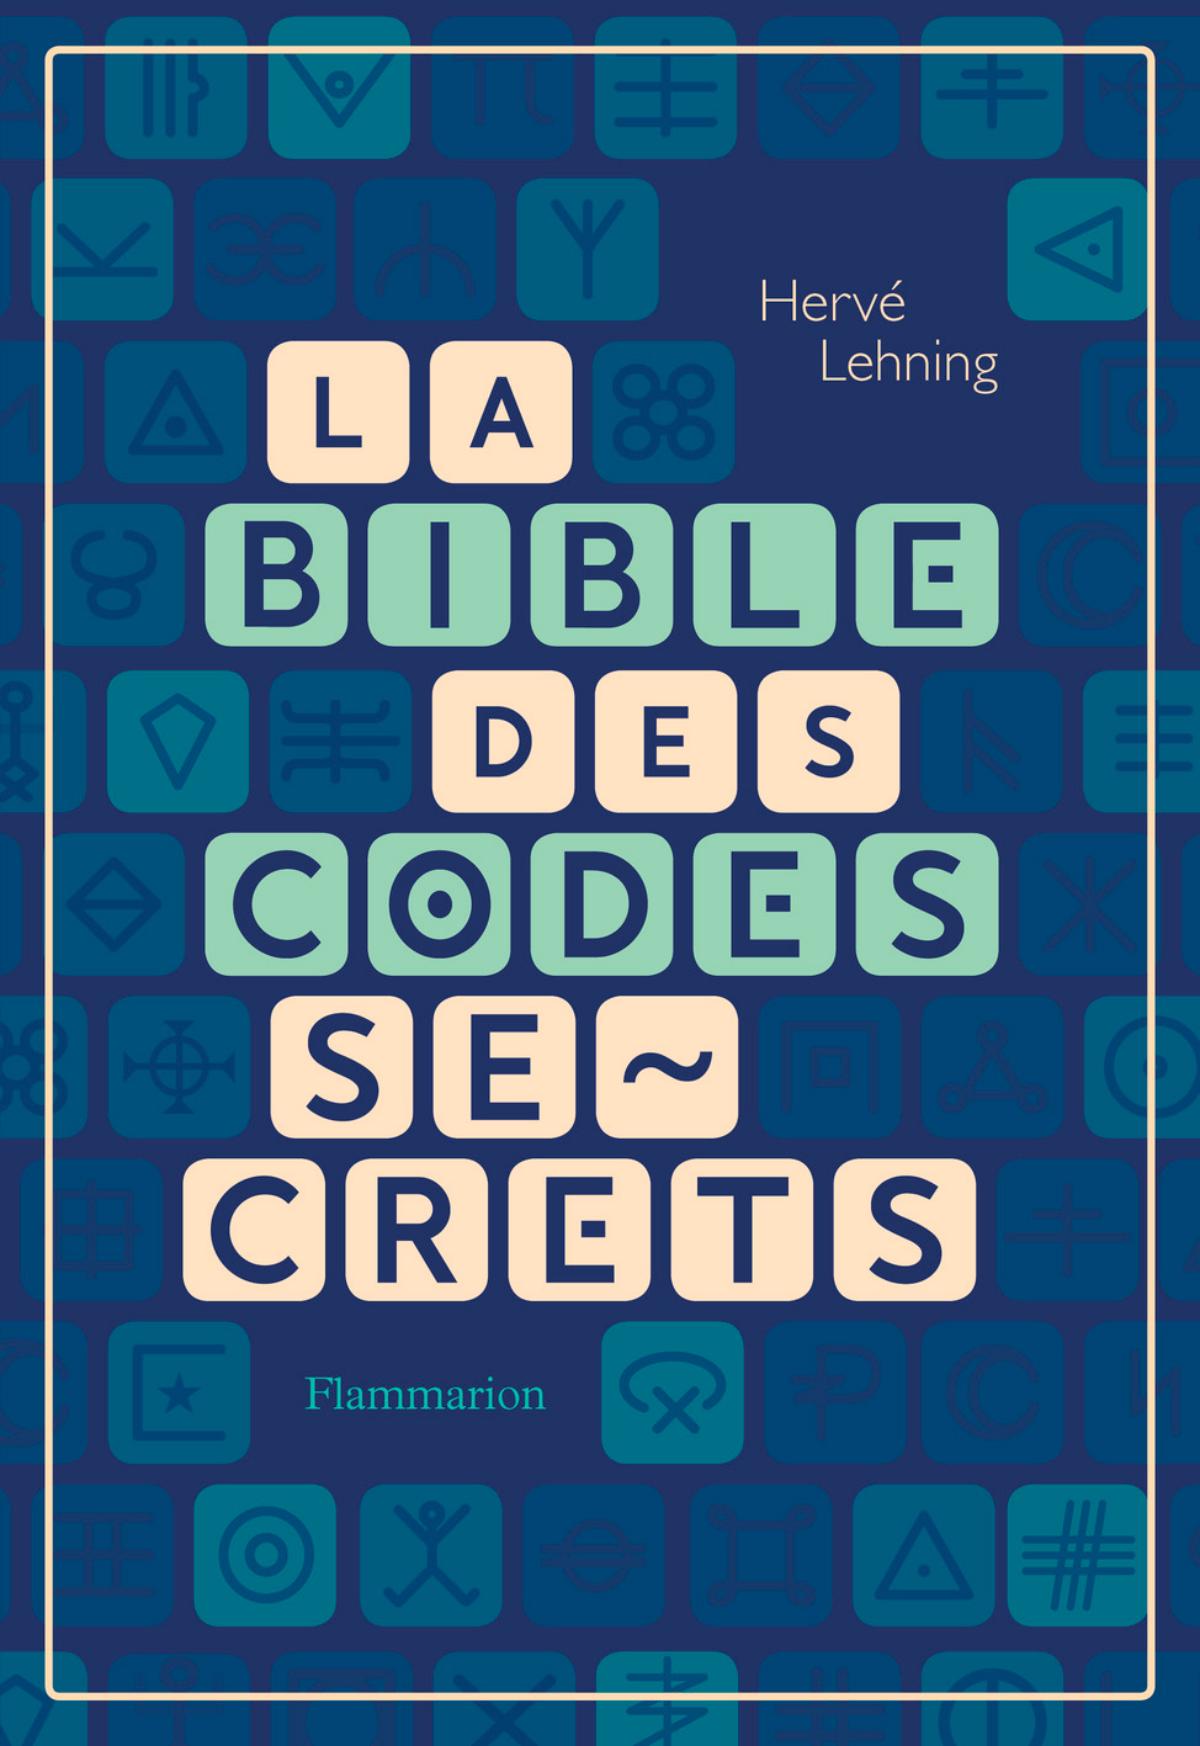 La bible des codes secrets (H. Lehning, Flammarion)